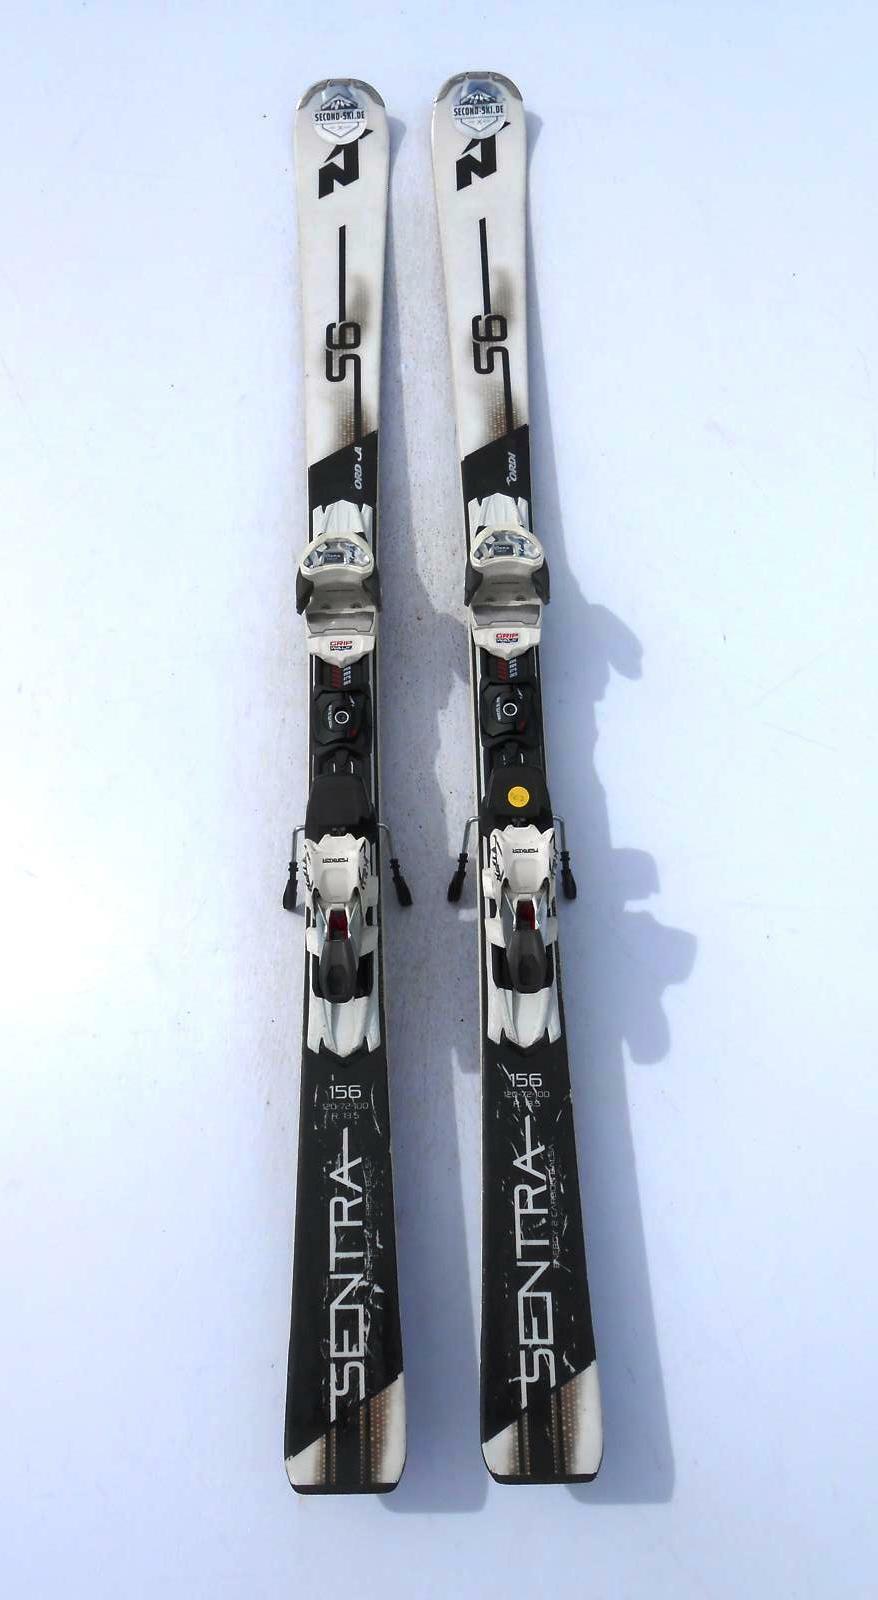 NORDICA Sentra SL 6 Premium-Ski Länge 156cm (1,56m) inkl. Bindung   367